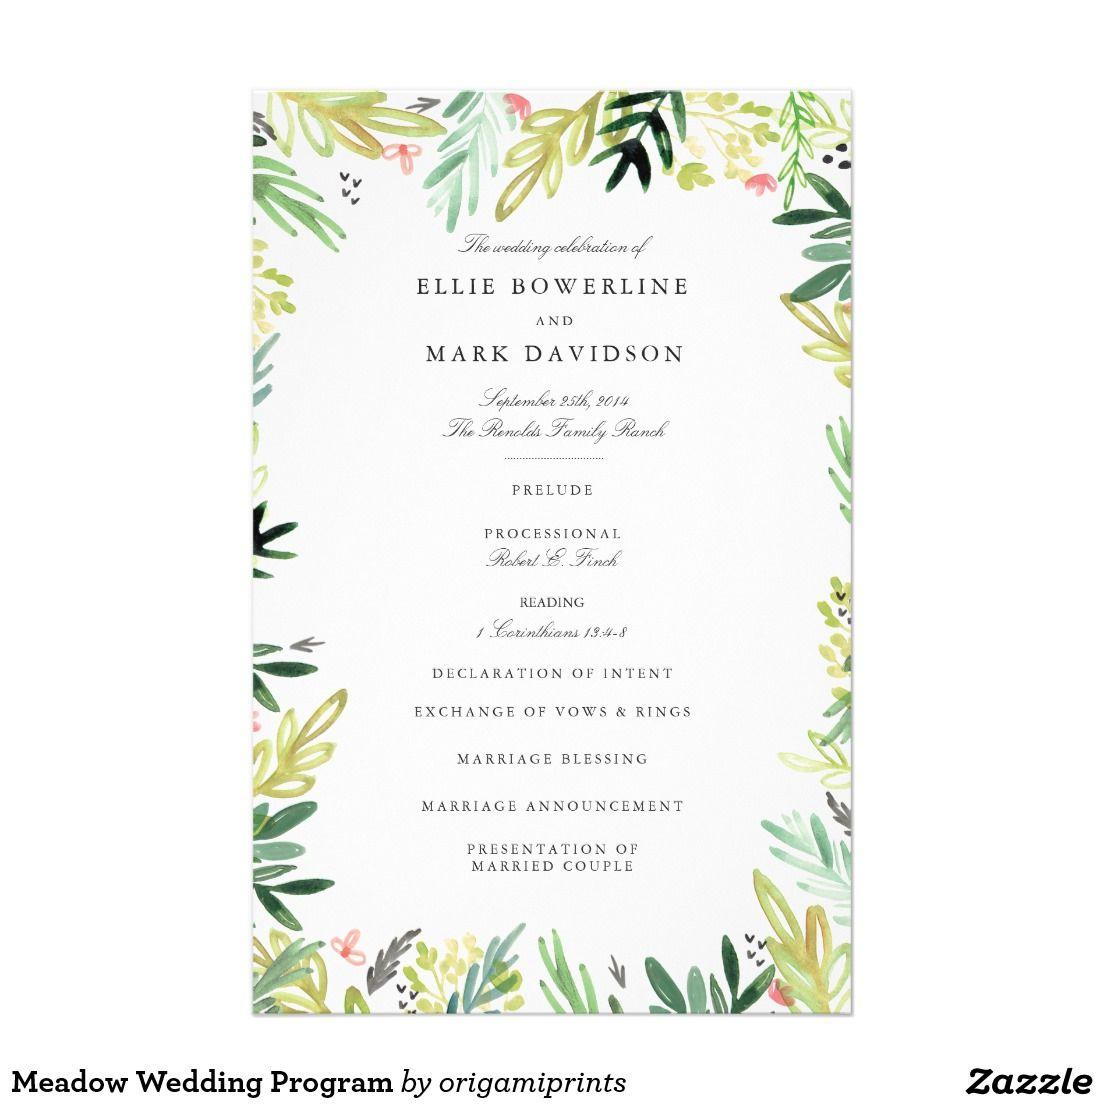 meadow wedding program wedding invitations favors and more